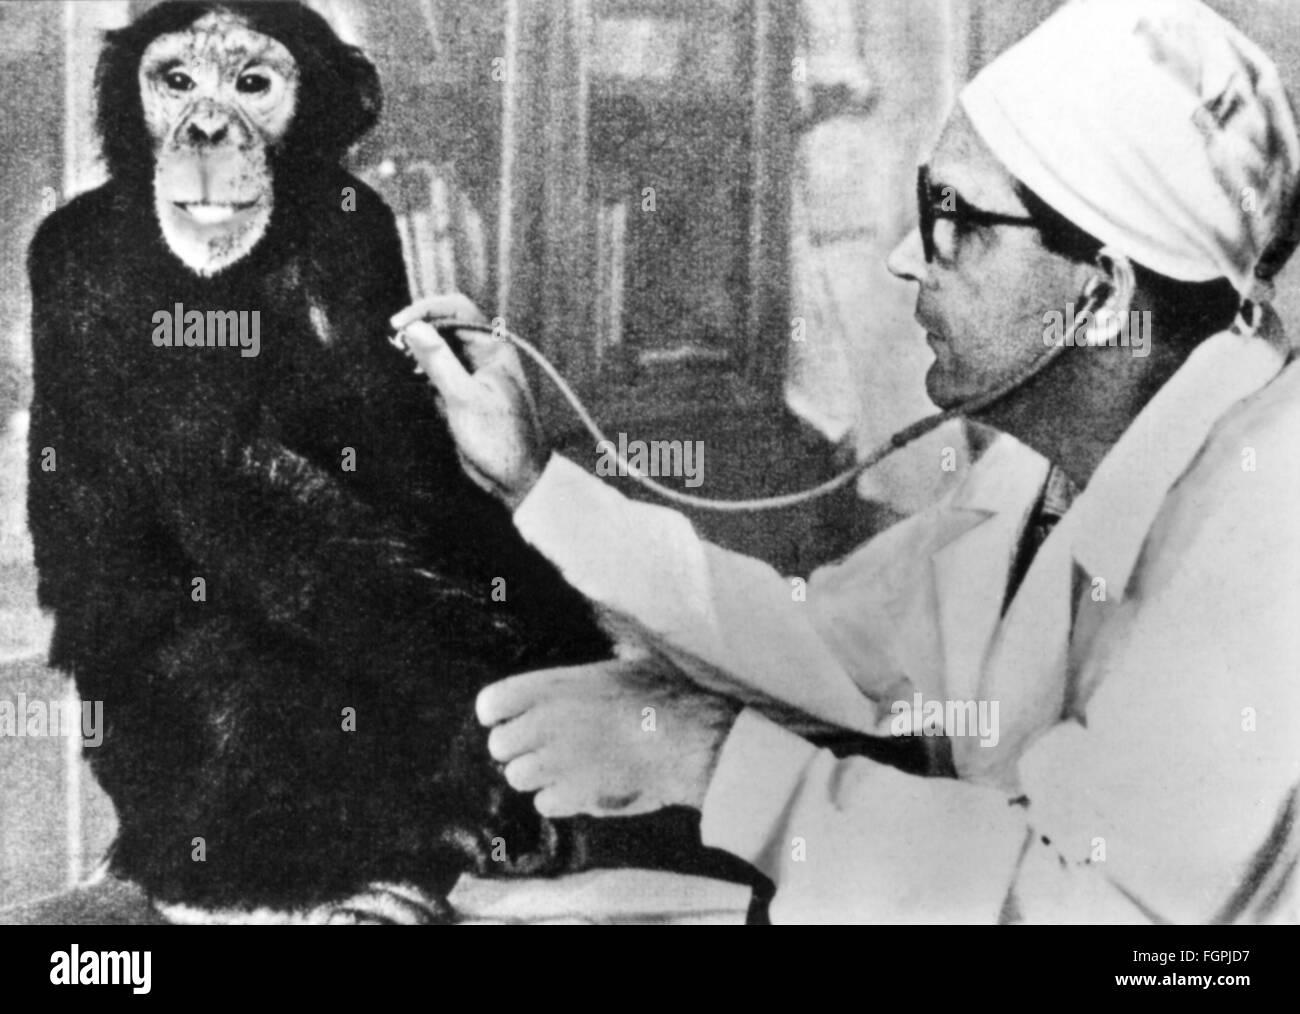 medicine, diseases, poliomyelitis, examination of a chimpanzee, institute for scientific research of poliomyelitis, - Stock Image